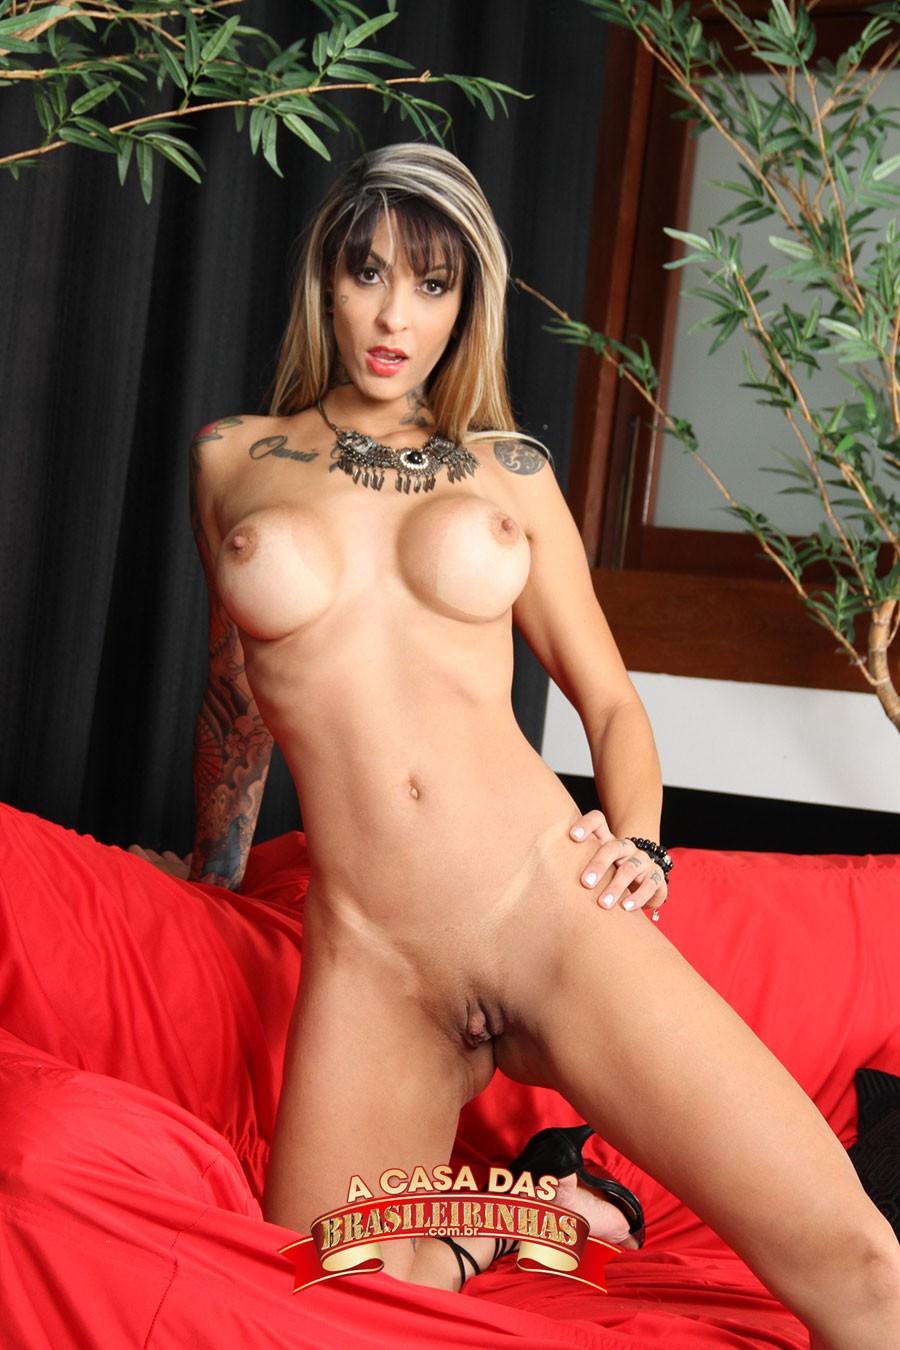 atriz-porno-brasileira-Barbara-Inked.jpg